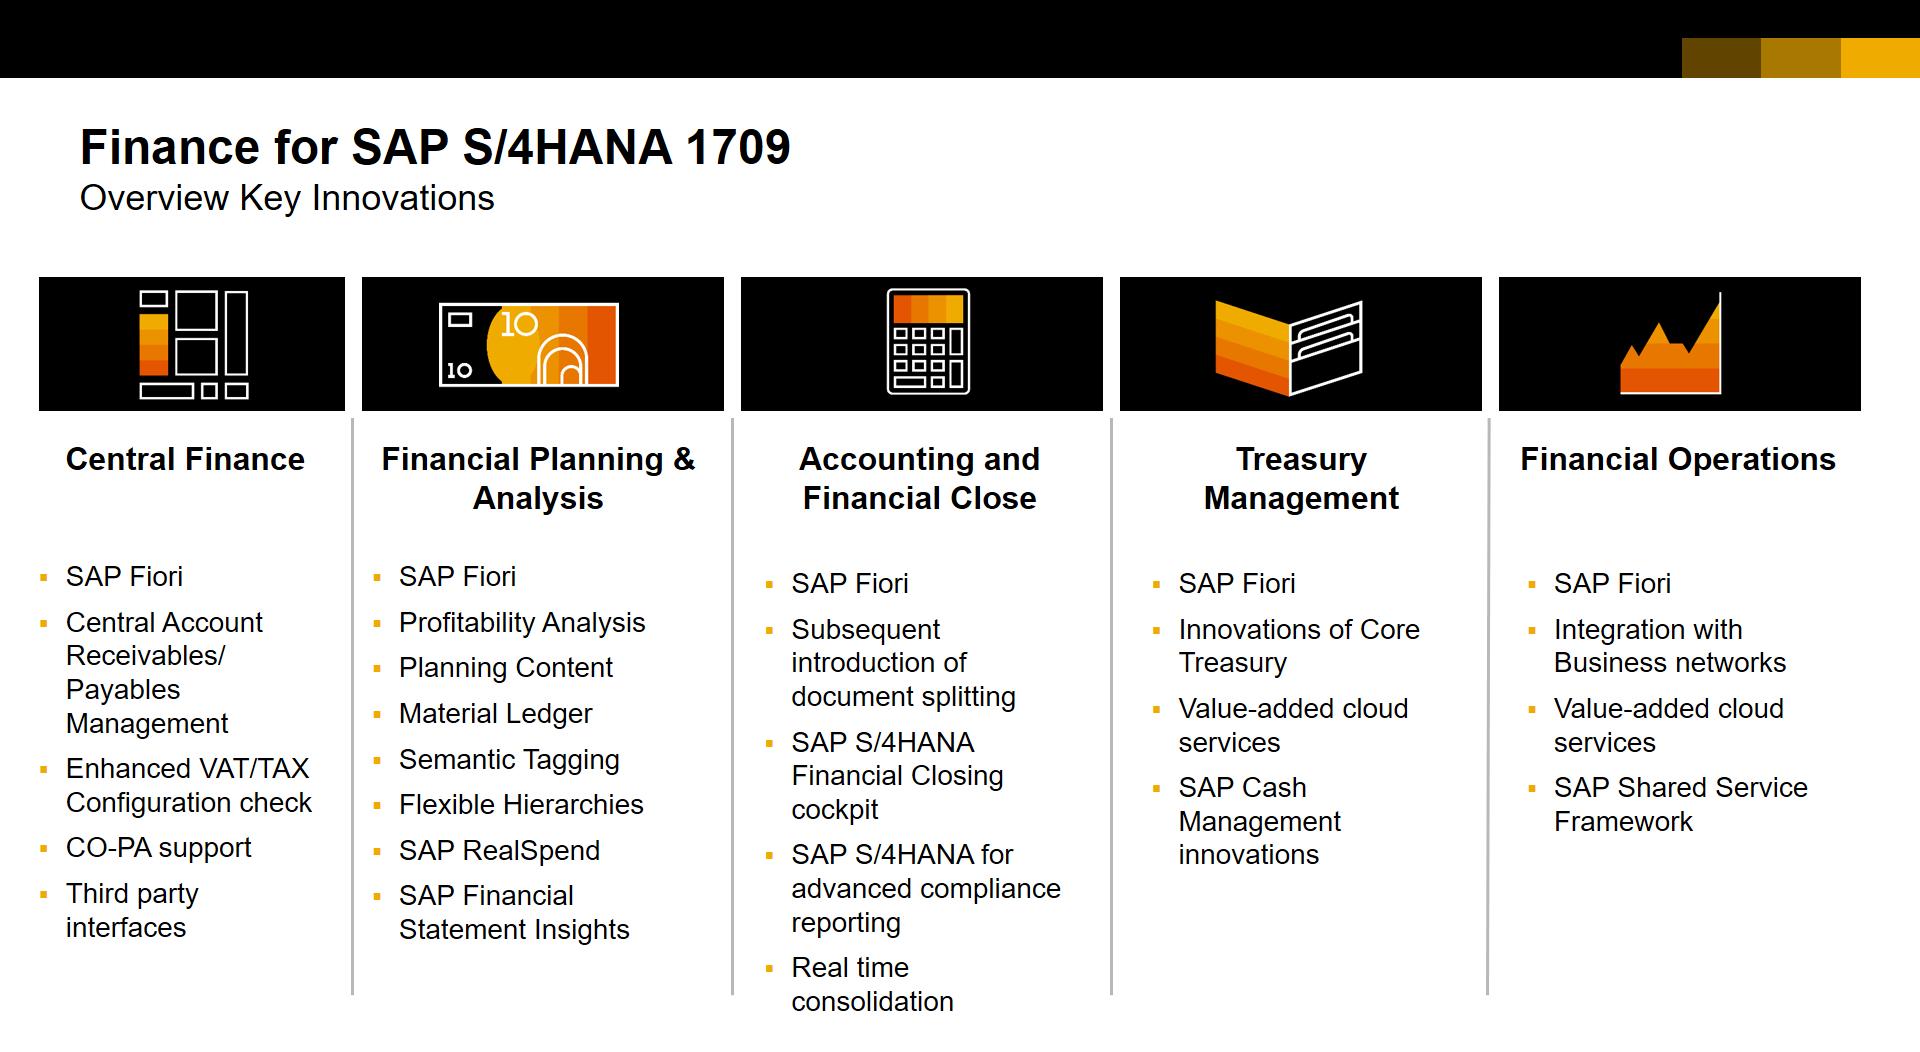 product management update  sap  s4hana 1709 for finance